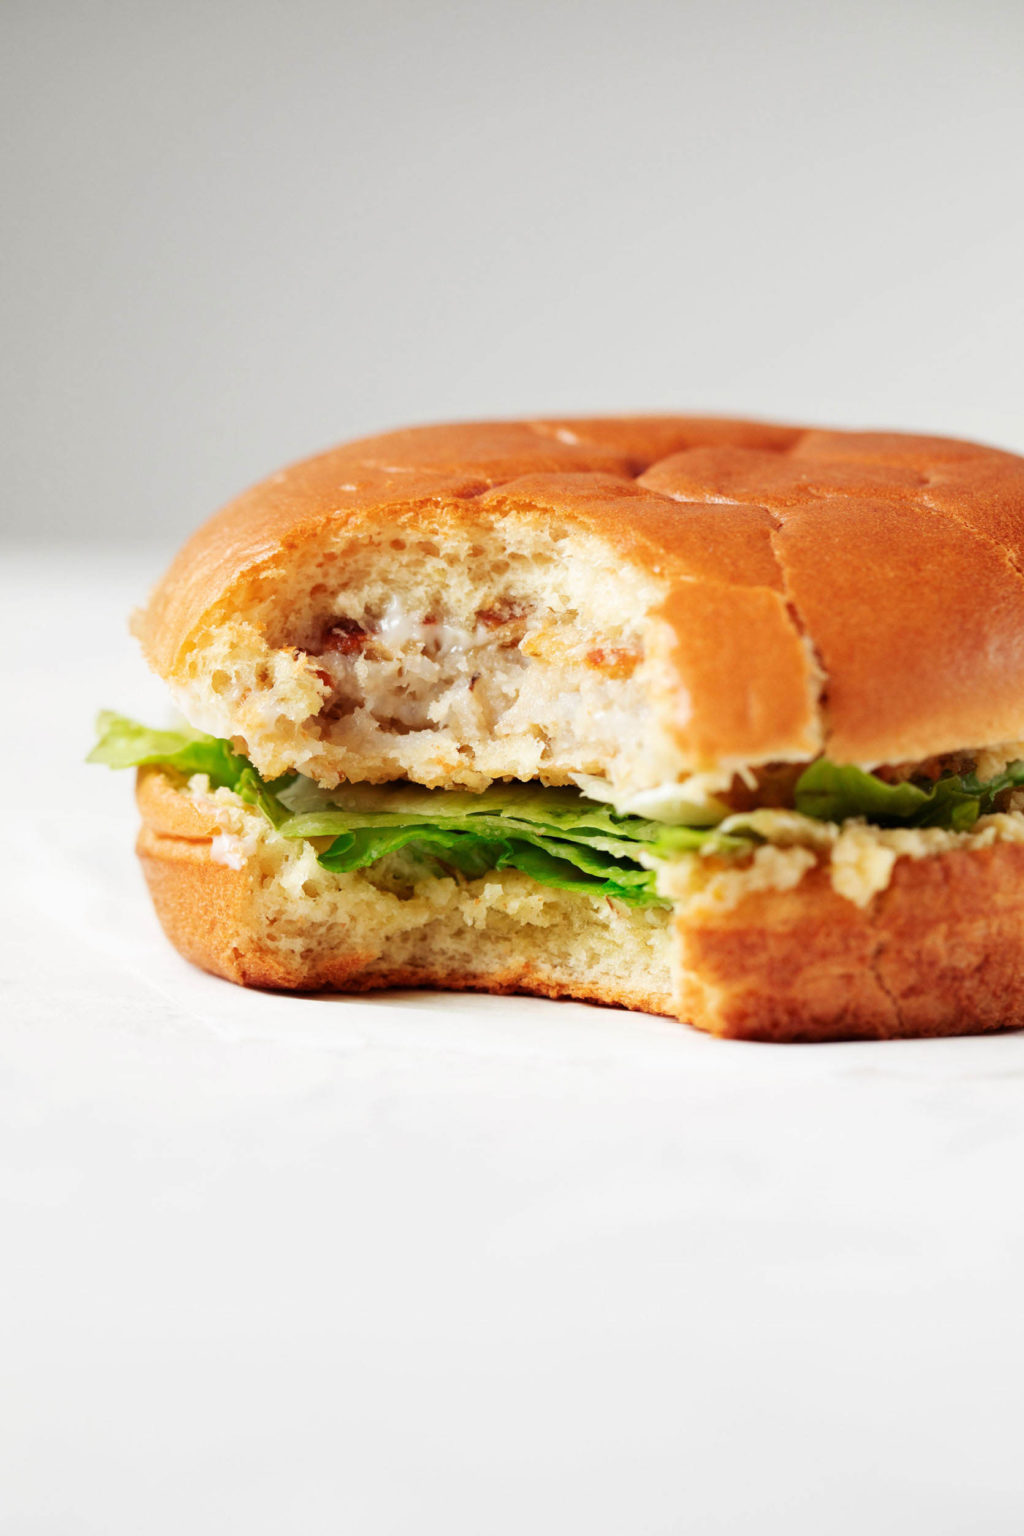 An artichoke white bean burger is piled onto a burger bun. A single bite has been taken out of the burger.